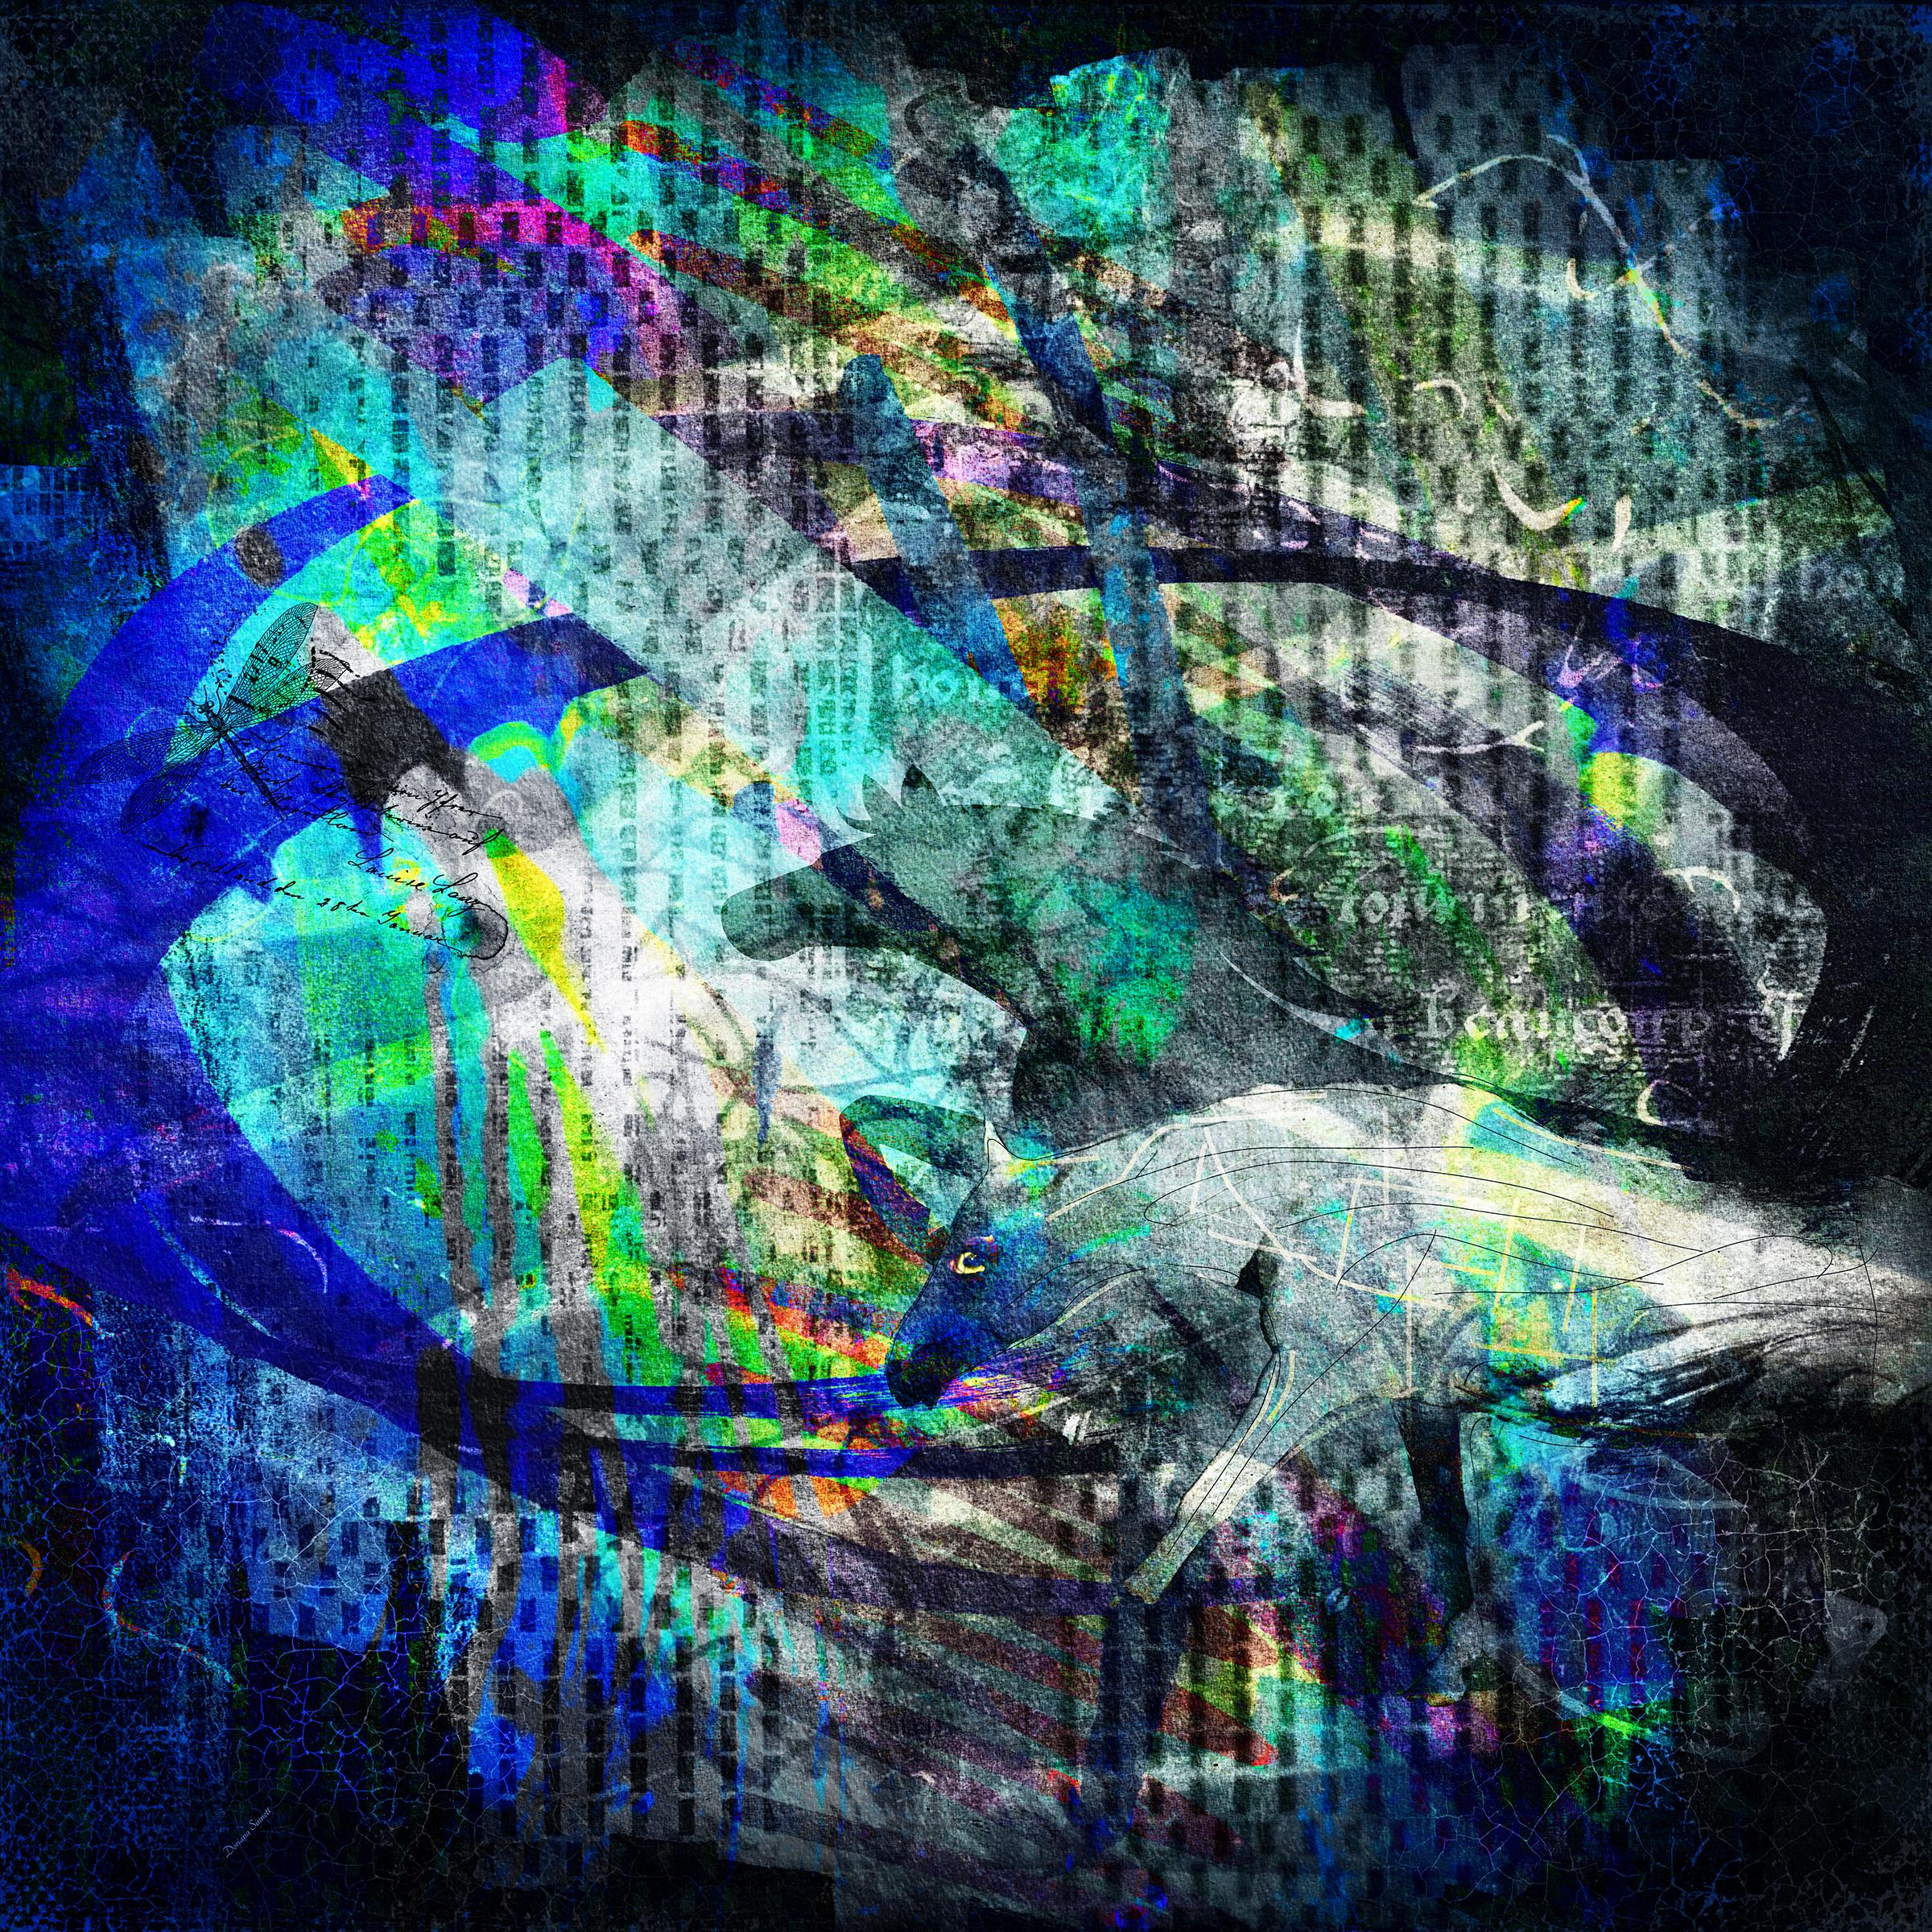 Abstract Horse…BUY  https://artboja.com/art/38vvy2/21248.php